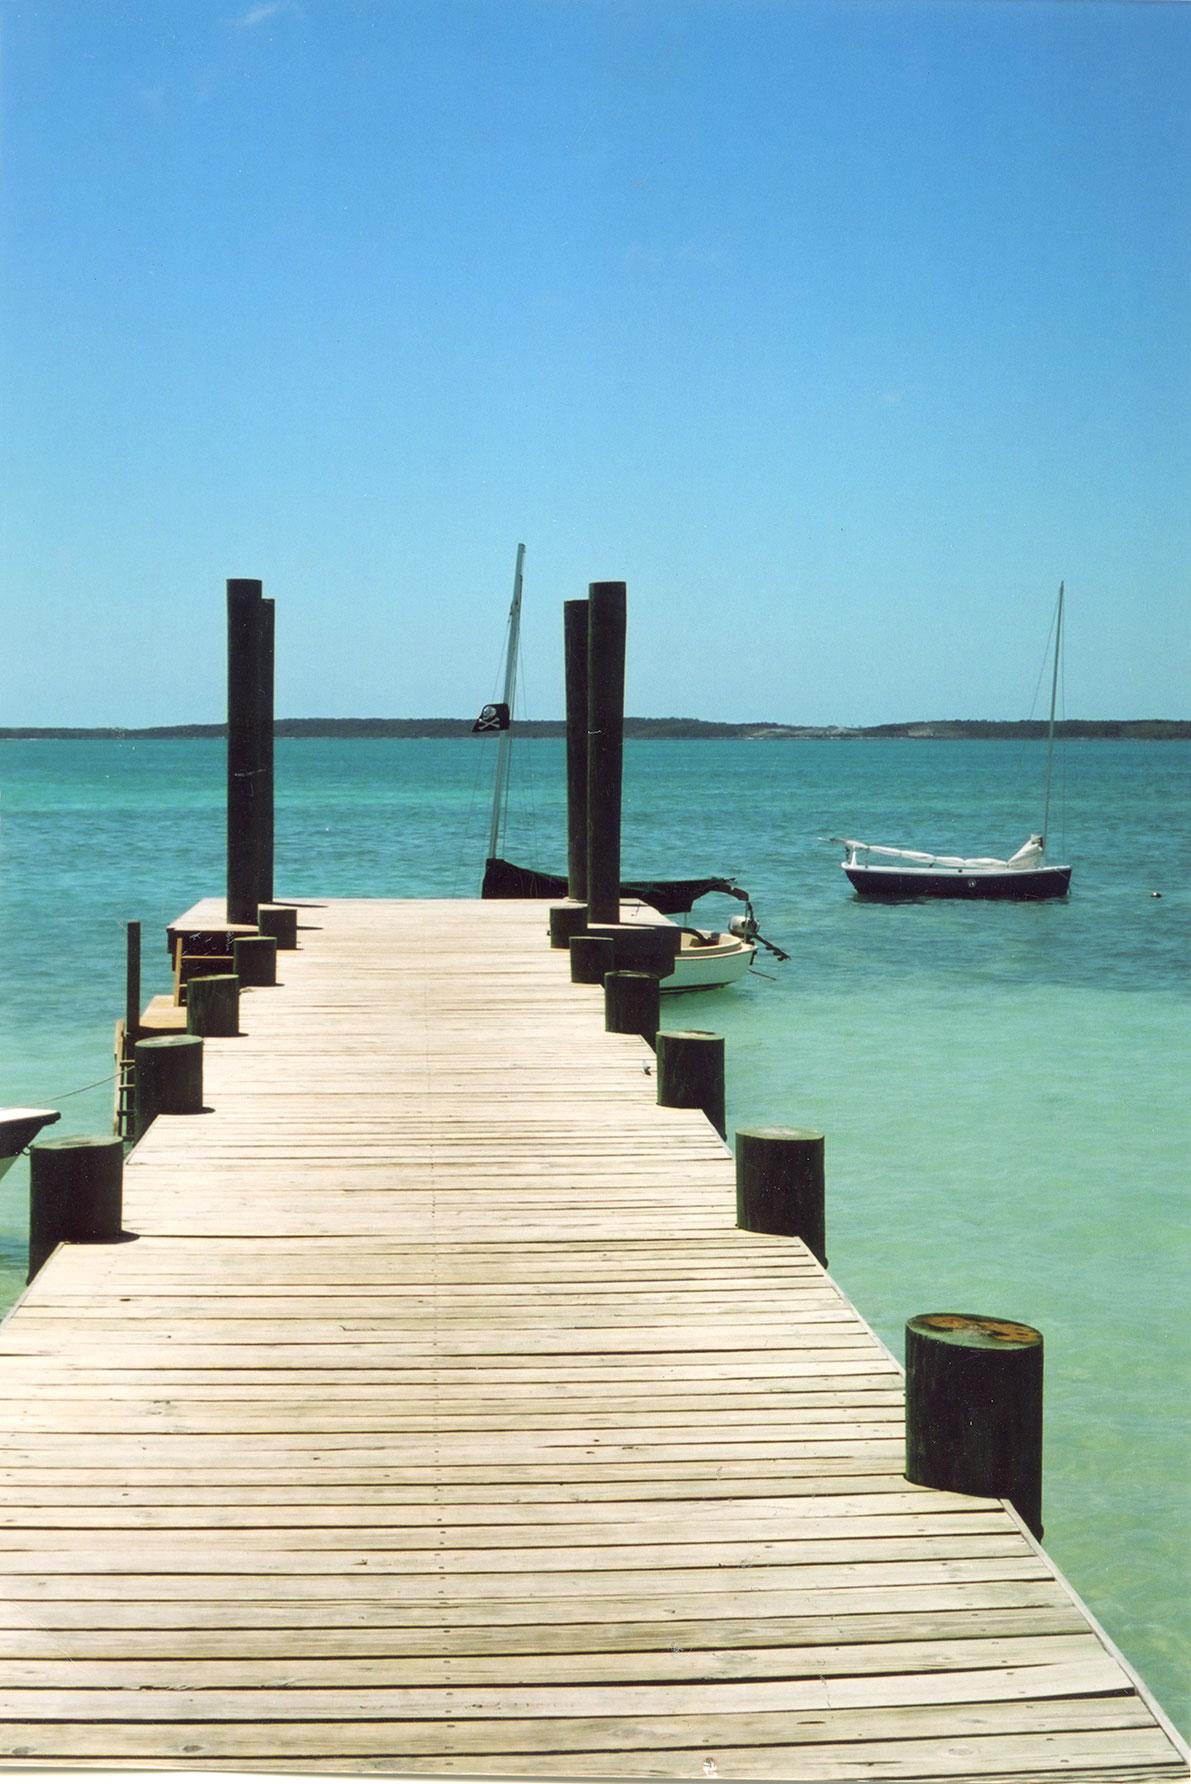 briland-dock-smkm.jpg